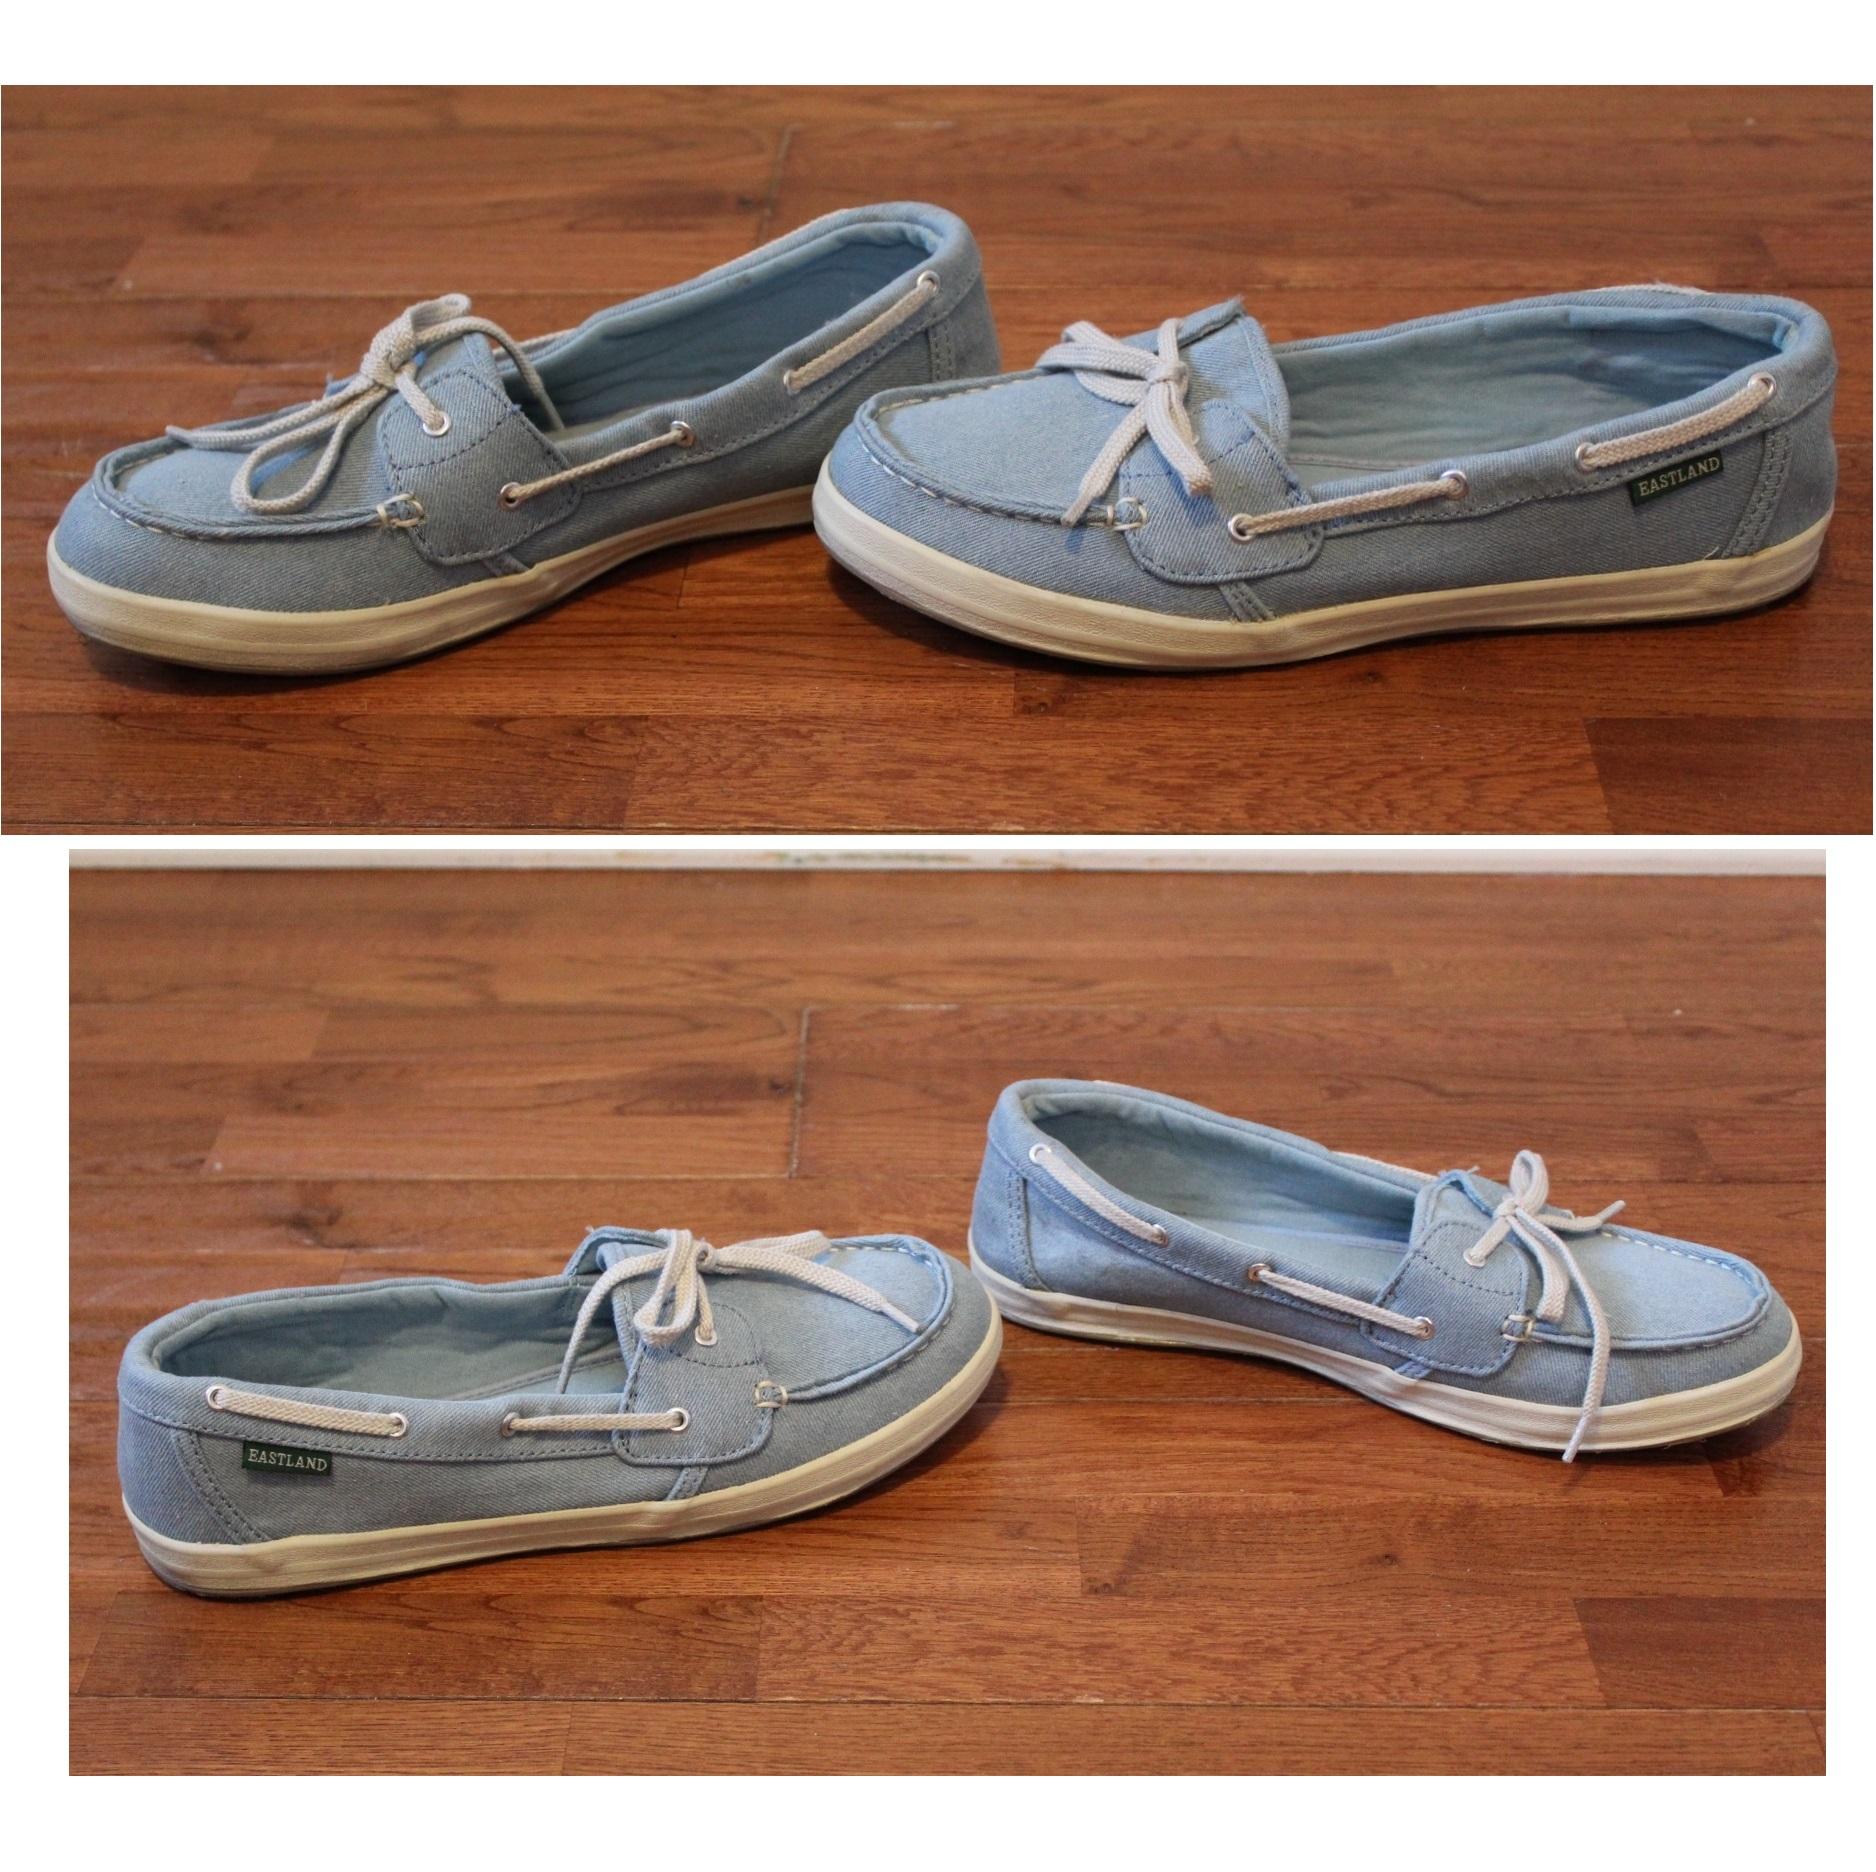 8a79a7766a52 Eastland Skip Denim Light Blue Boat Shoes Women s 9.5 Fit Like Wide